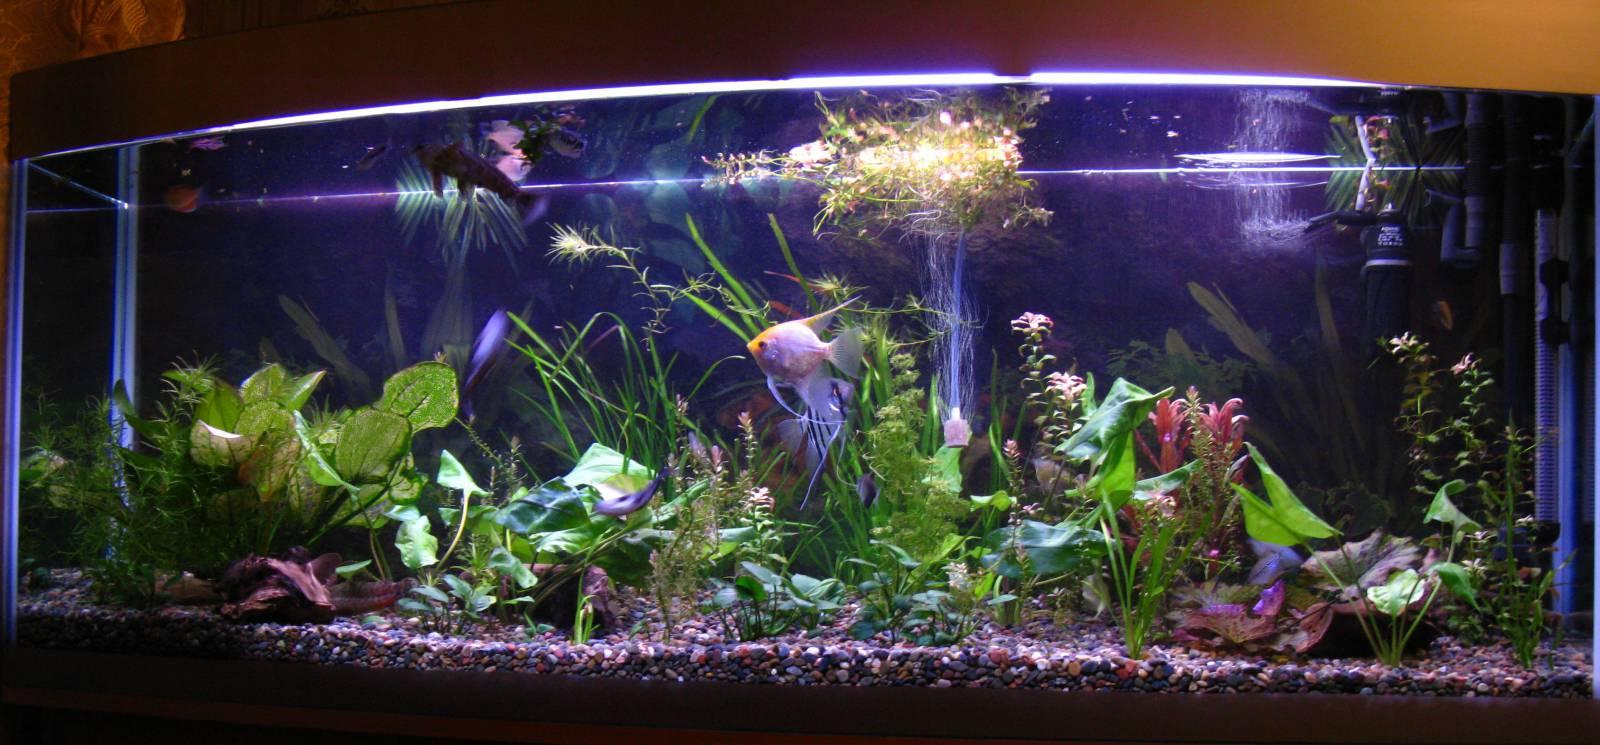 akvarium2